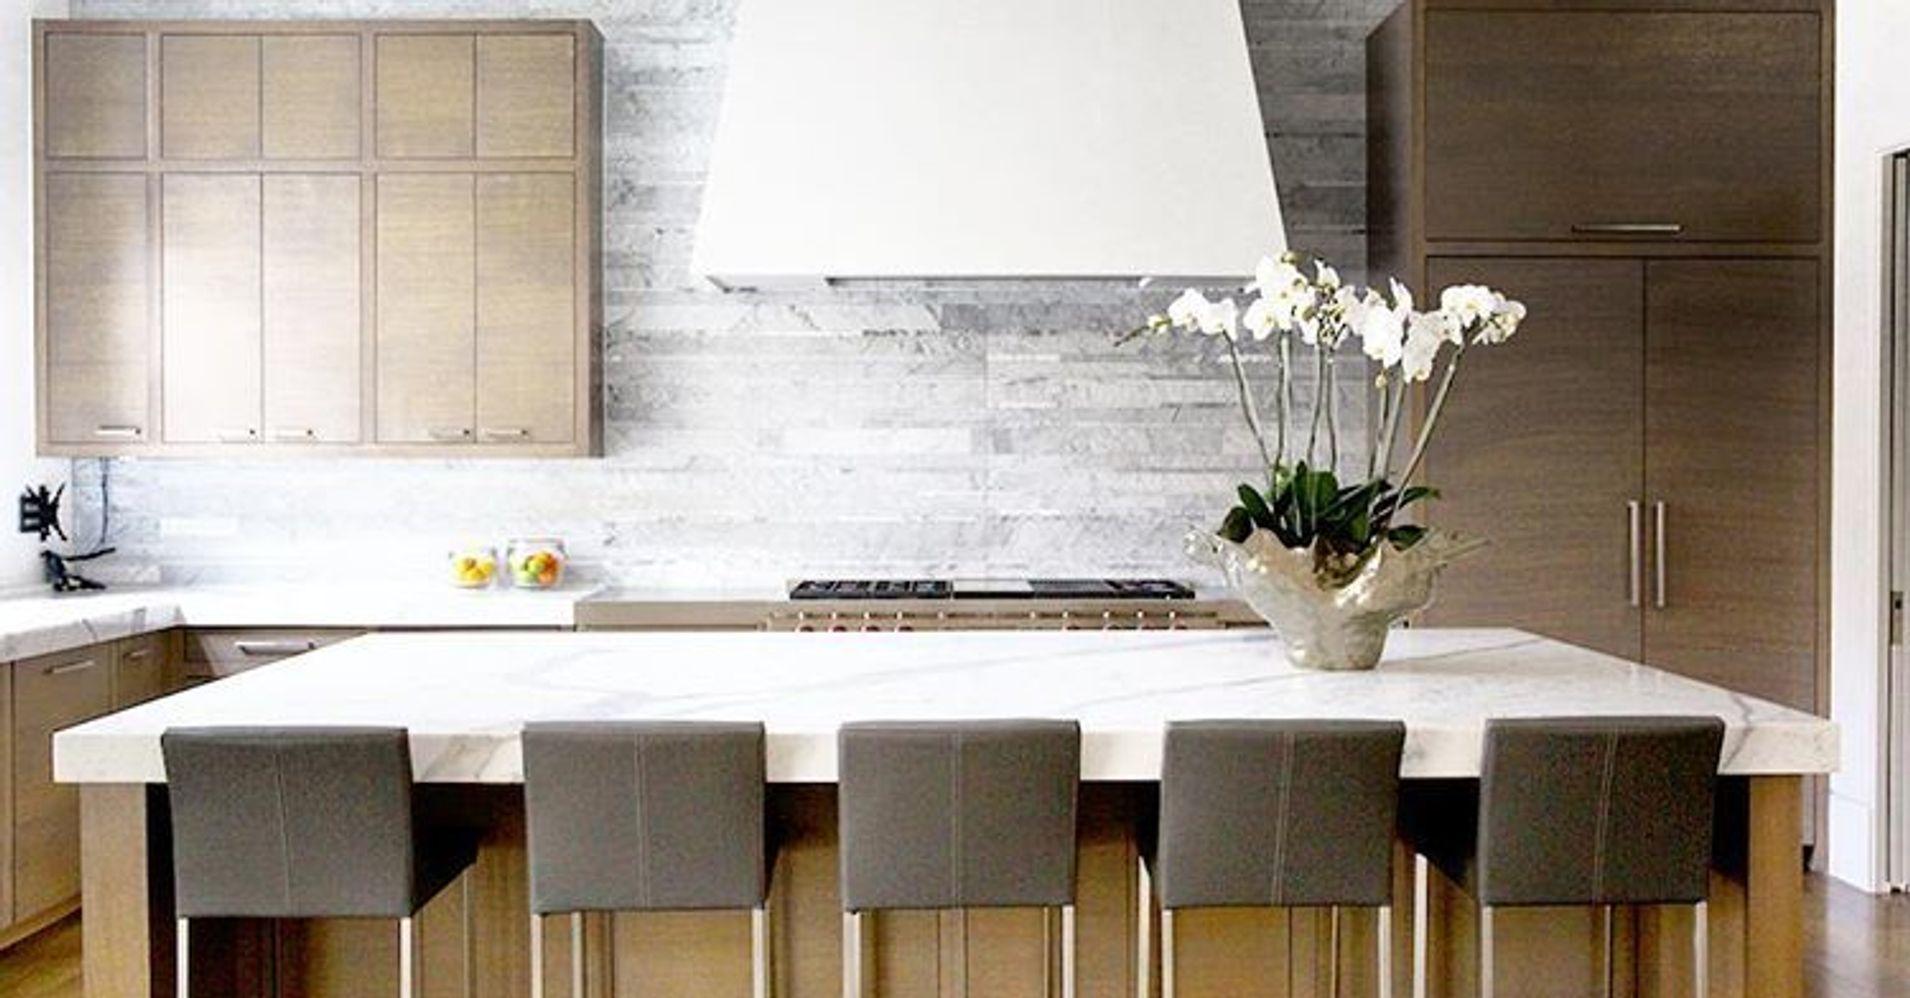 A Luxury Kitchen Backsplash | HuffPost